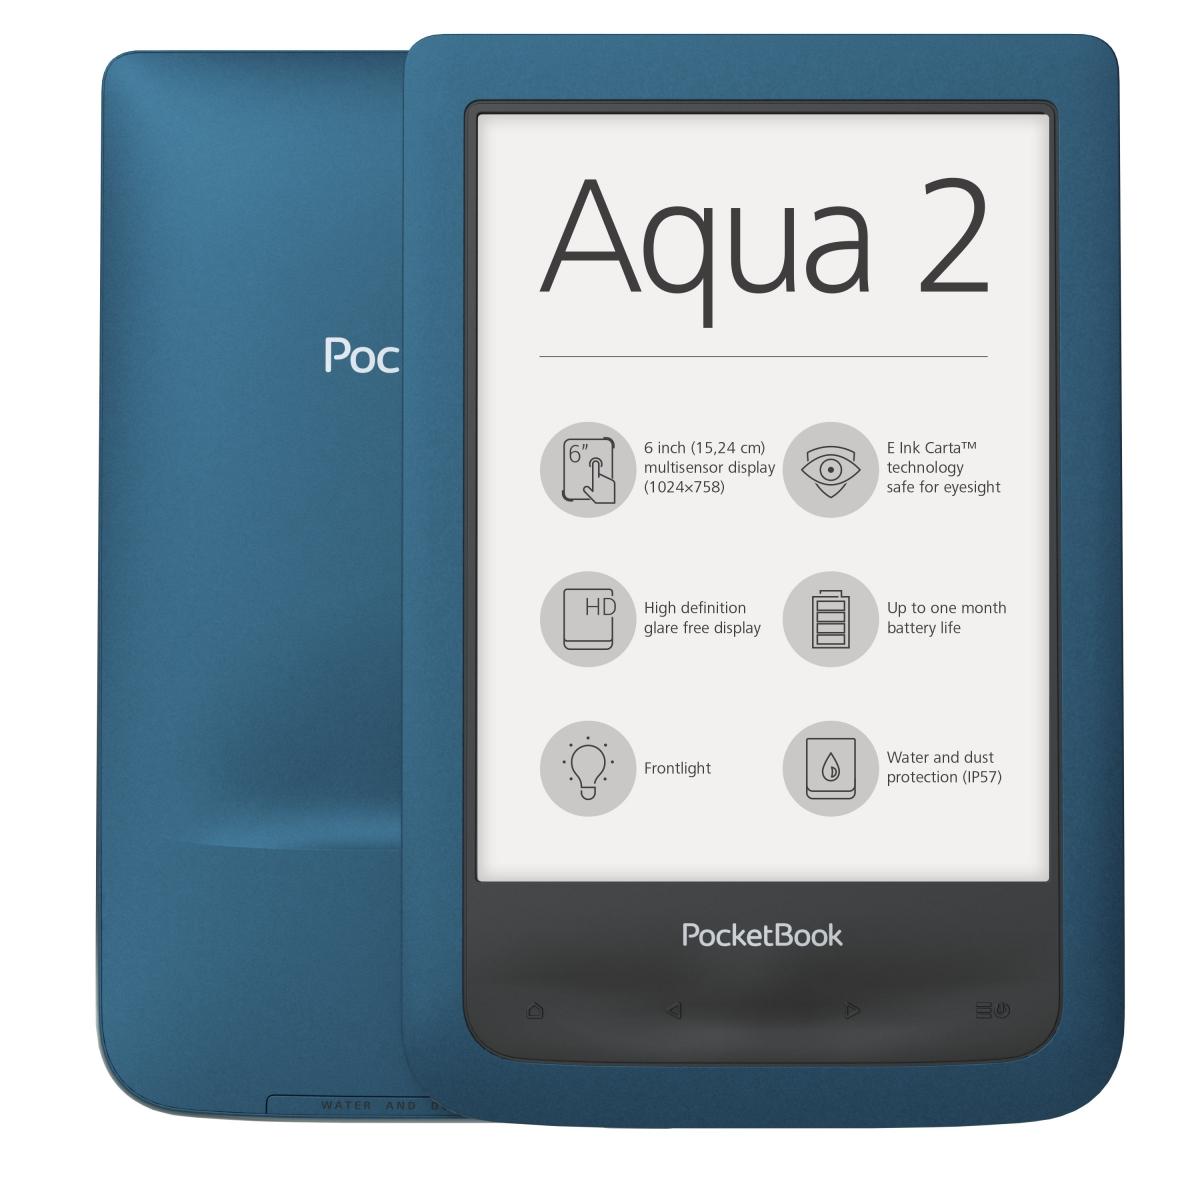 PocketBook 641 Aqua 2 wodoodporny czytnik